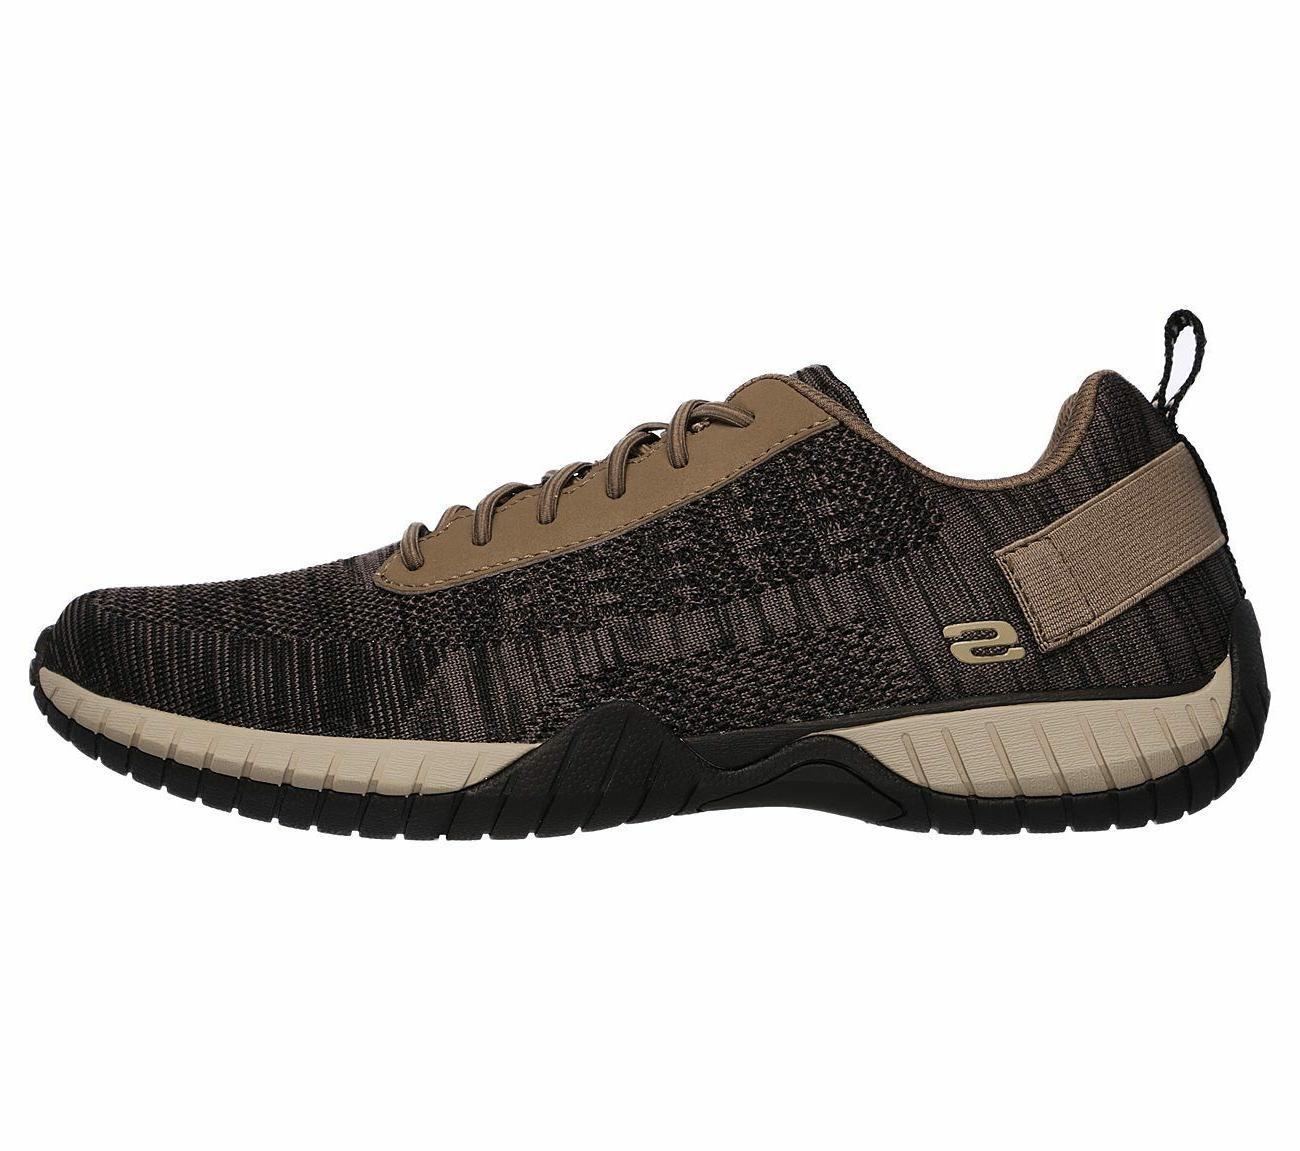 65182 Khaki Skechers shoe Men Comfort Oxford Mesh Fabric